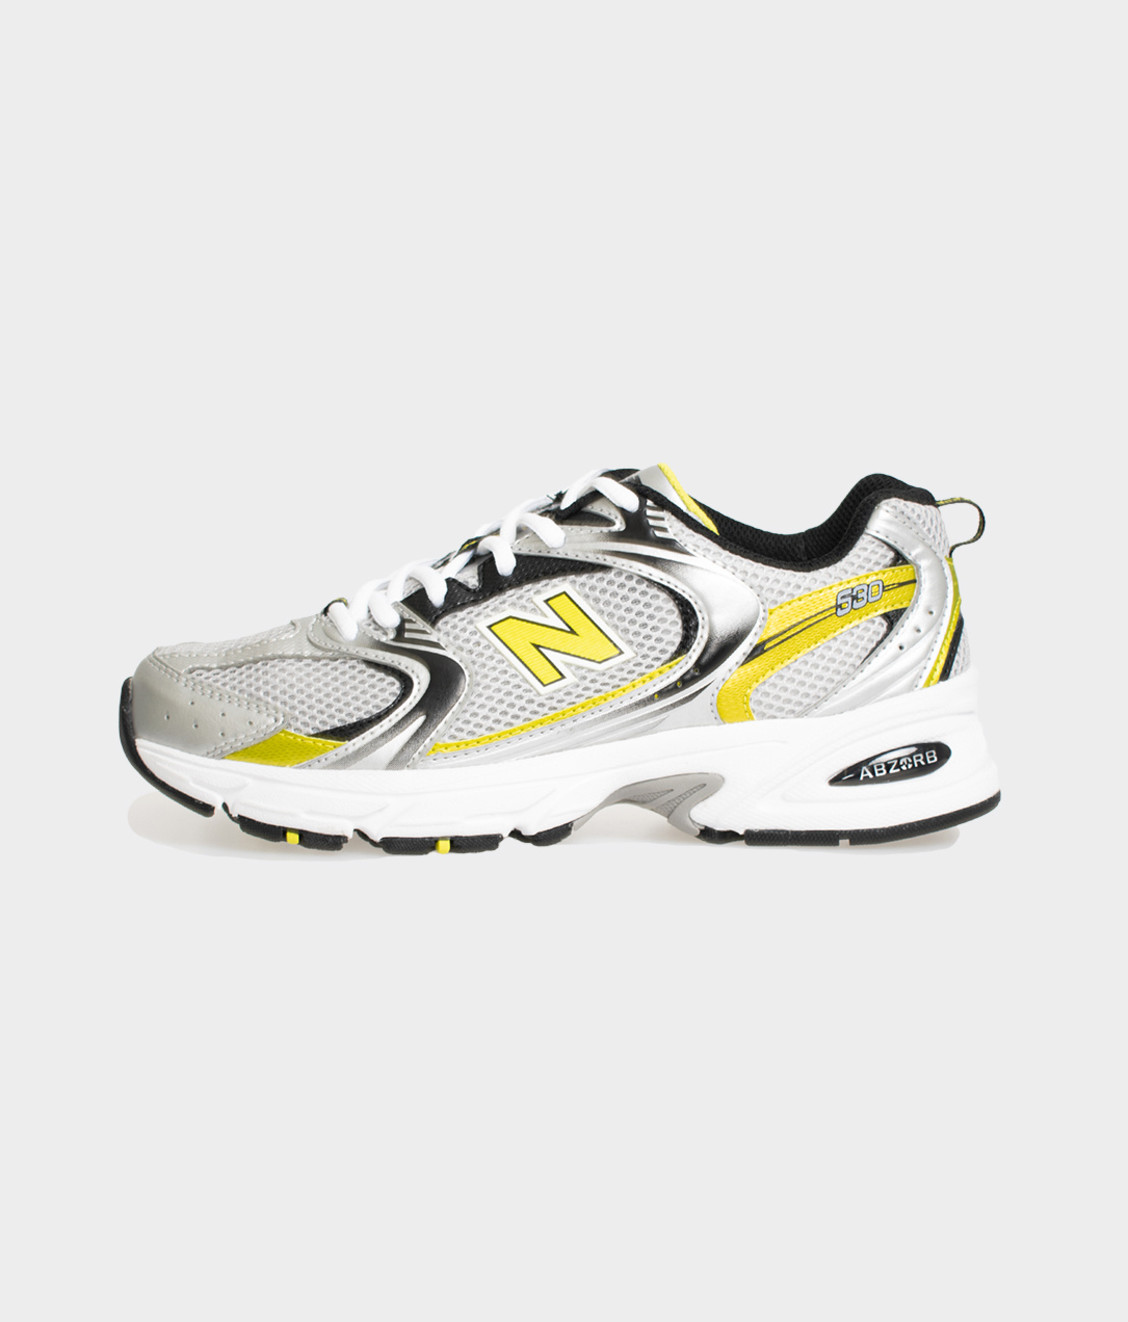 New Balance 530 SC Grey/Yellow